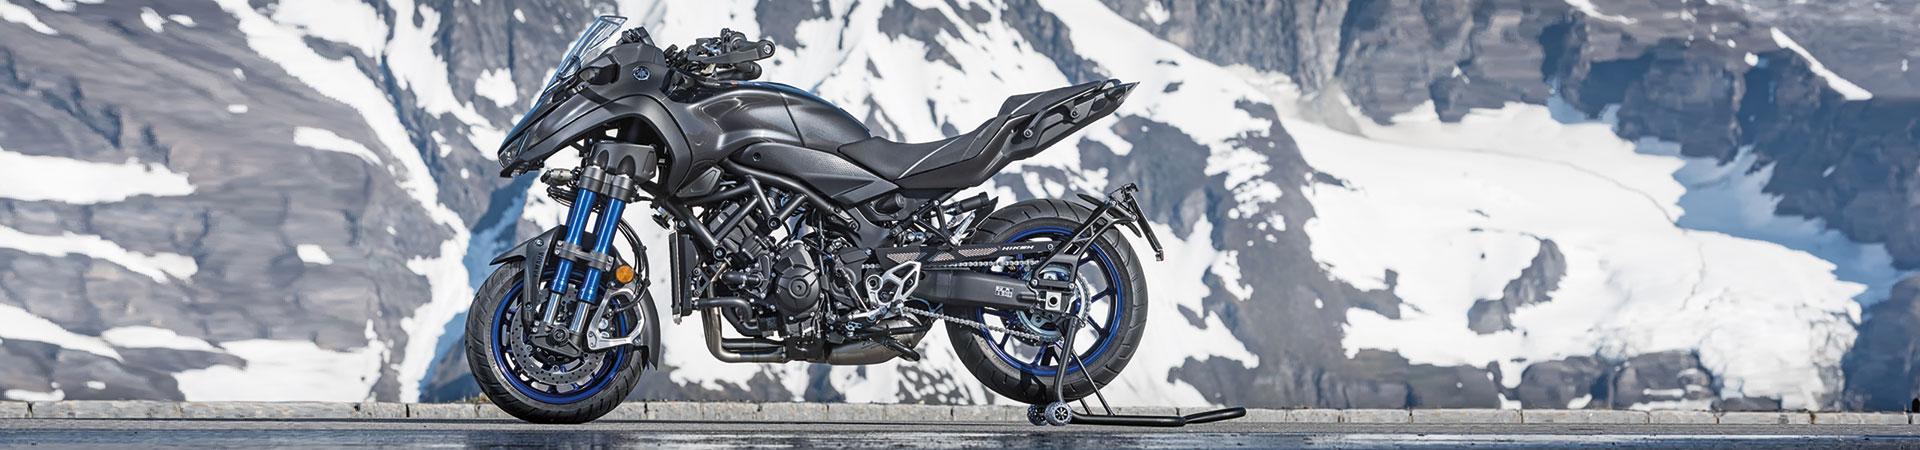 Yamaha-Niken-Modell-2018_03-09-2018_4c14f